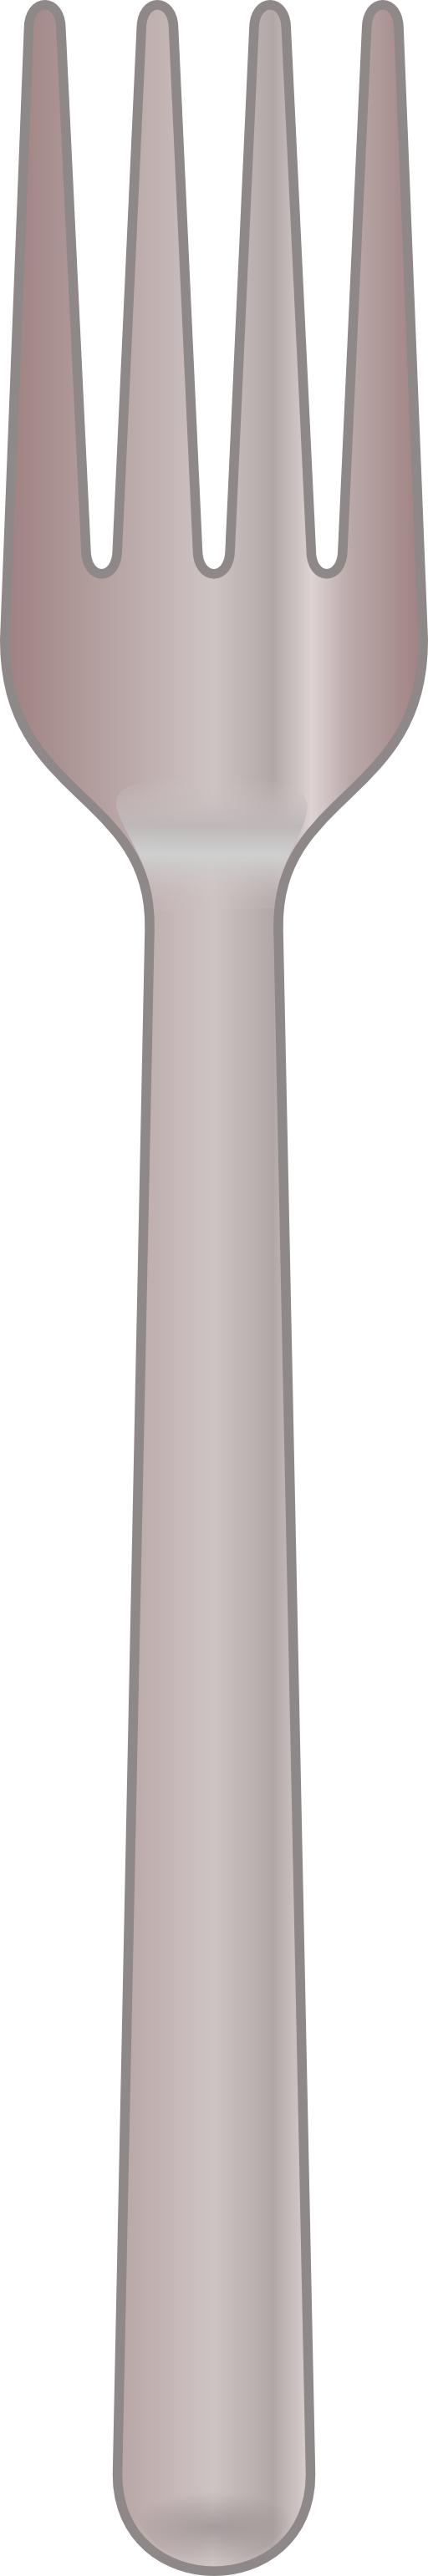 Best Fork Clipart #18005.